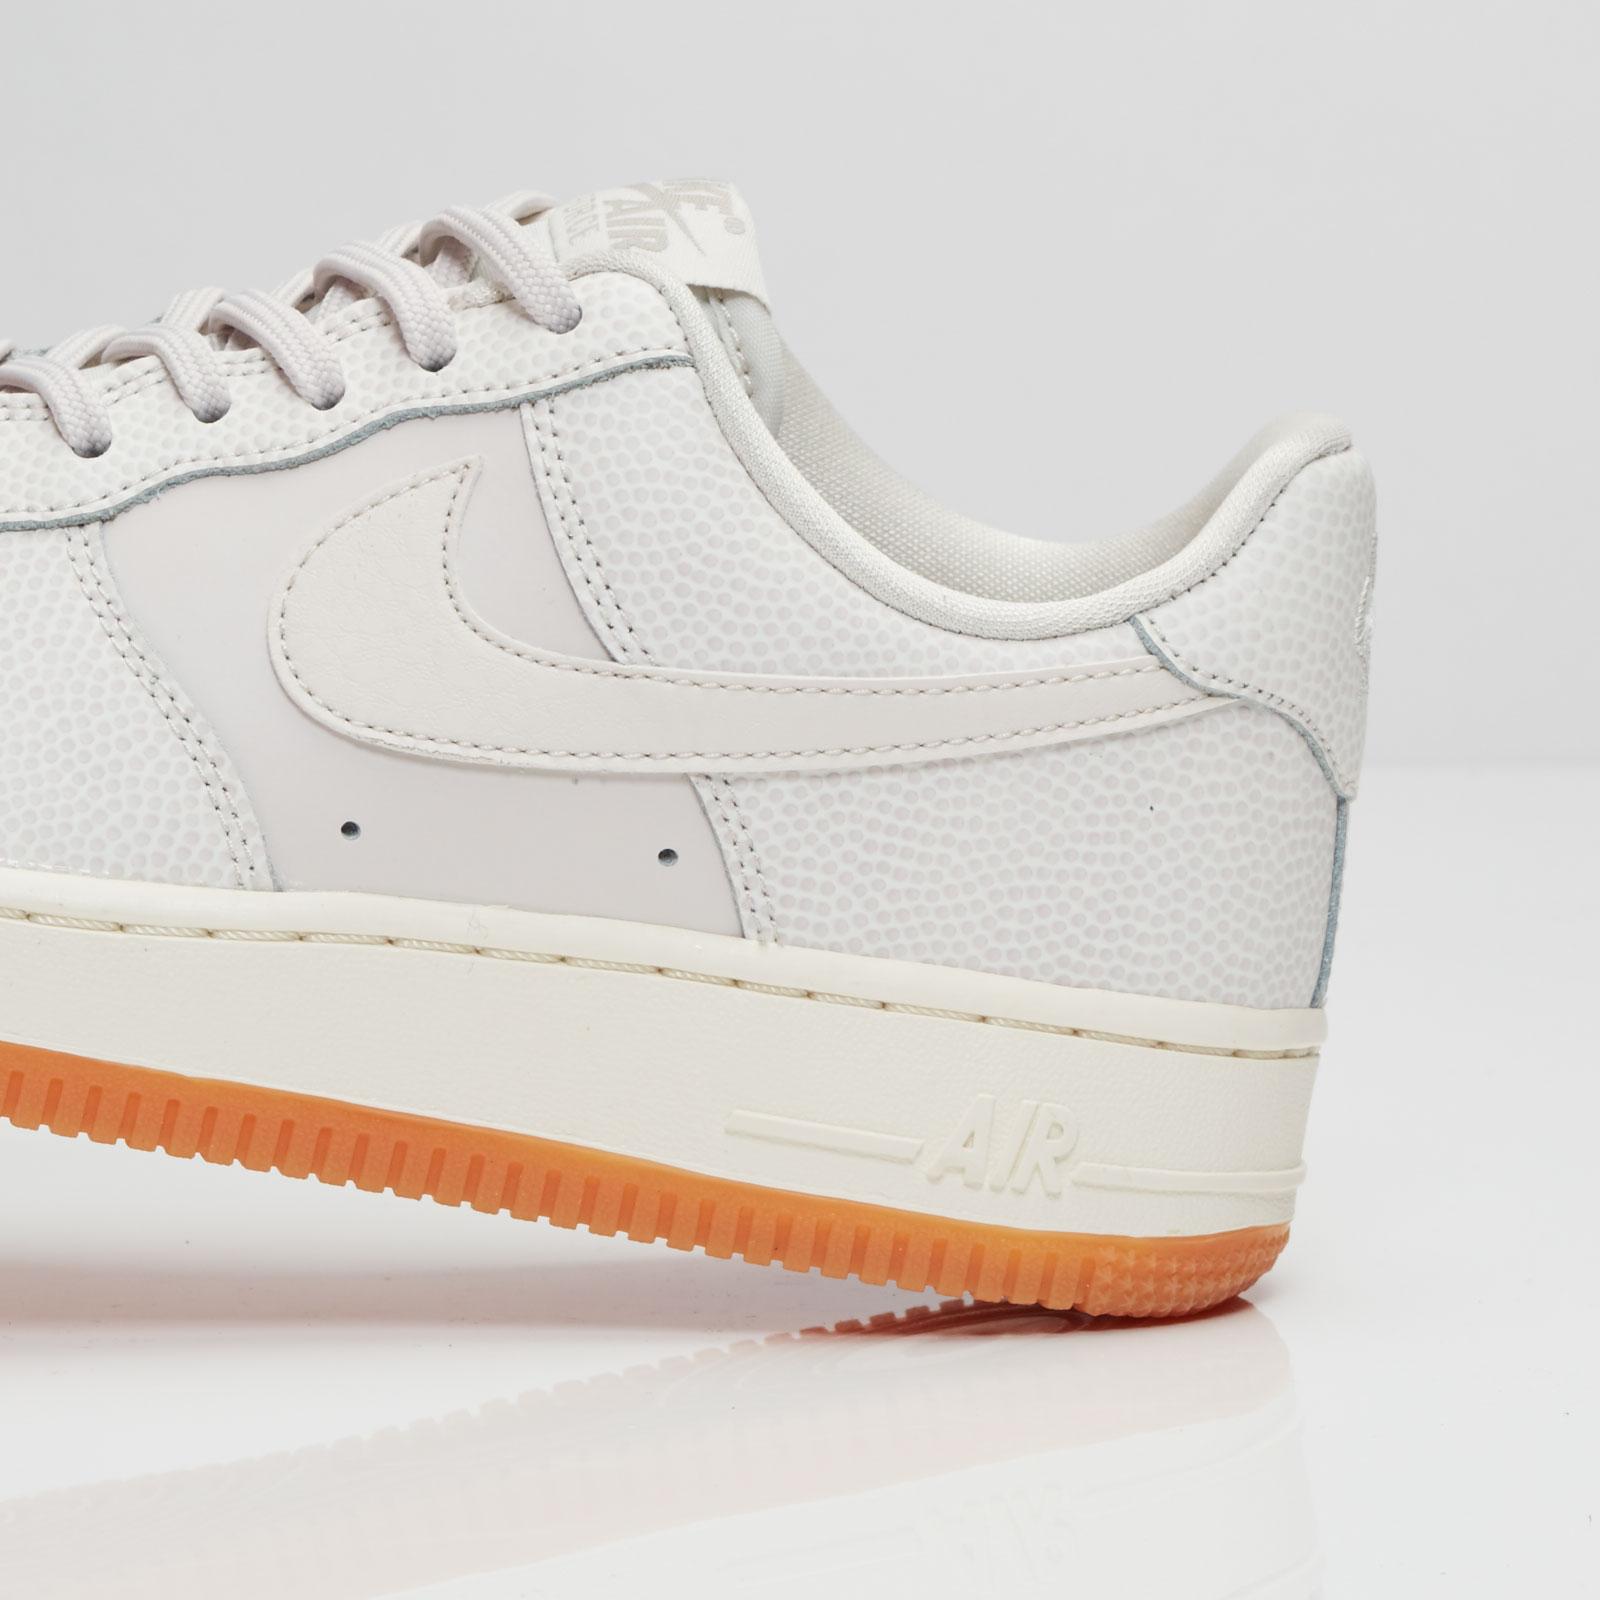 nike pullover, NIKE W AIR FORCE 1 '07 SEASONAL Sneakers